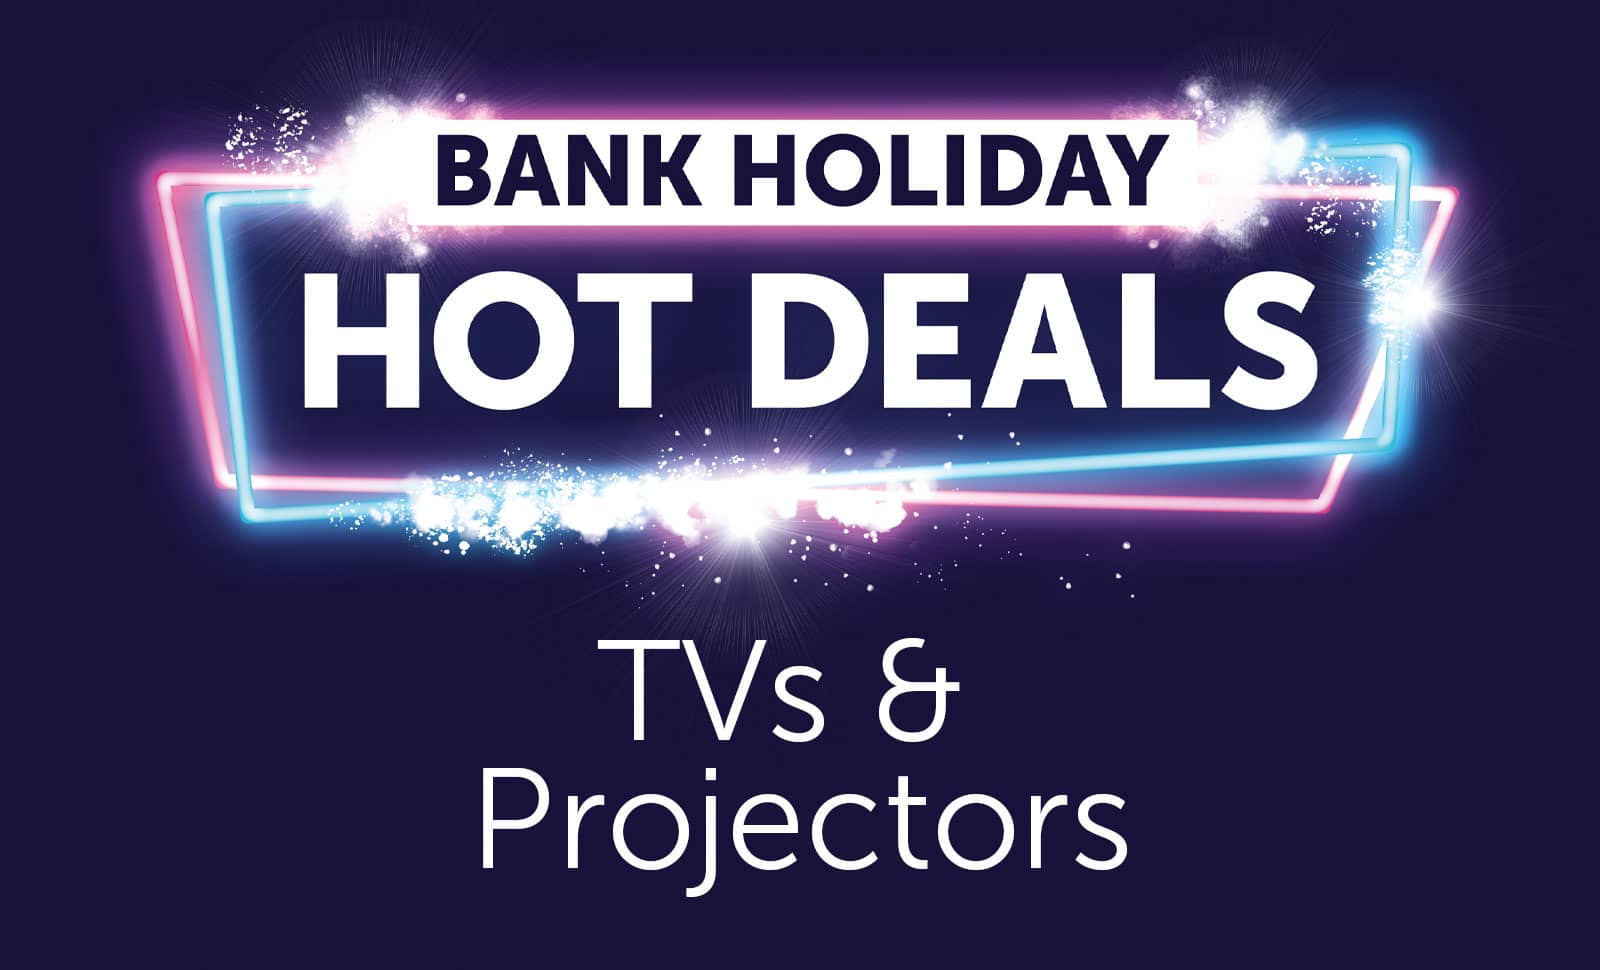 Bank Holiday - TV & Projector